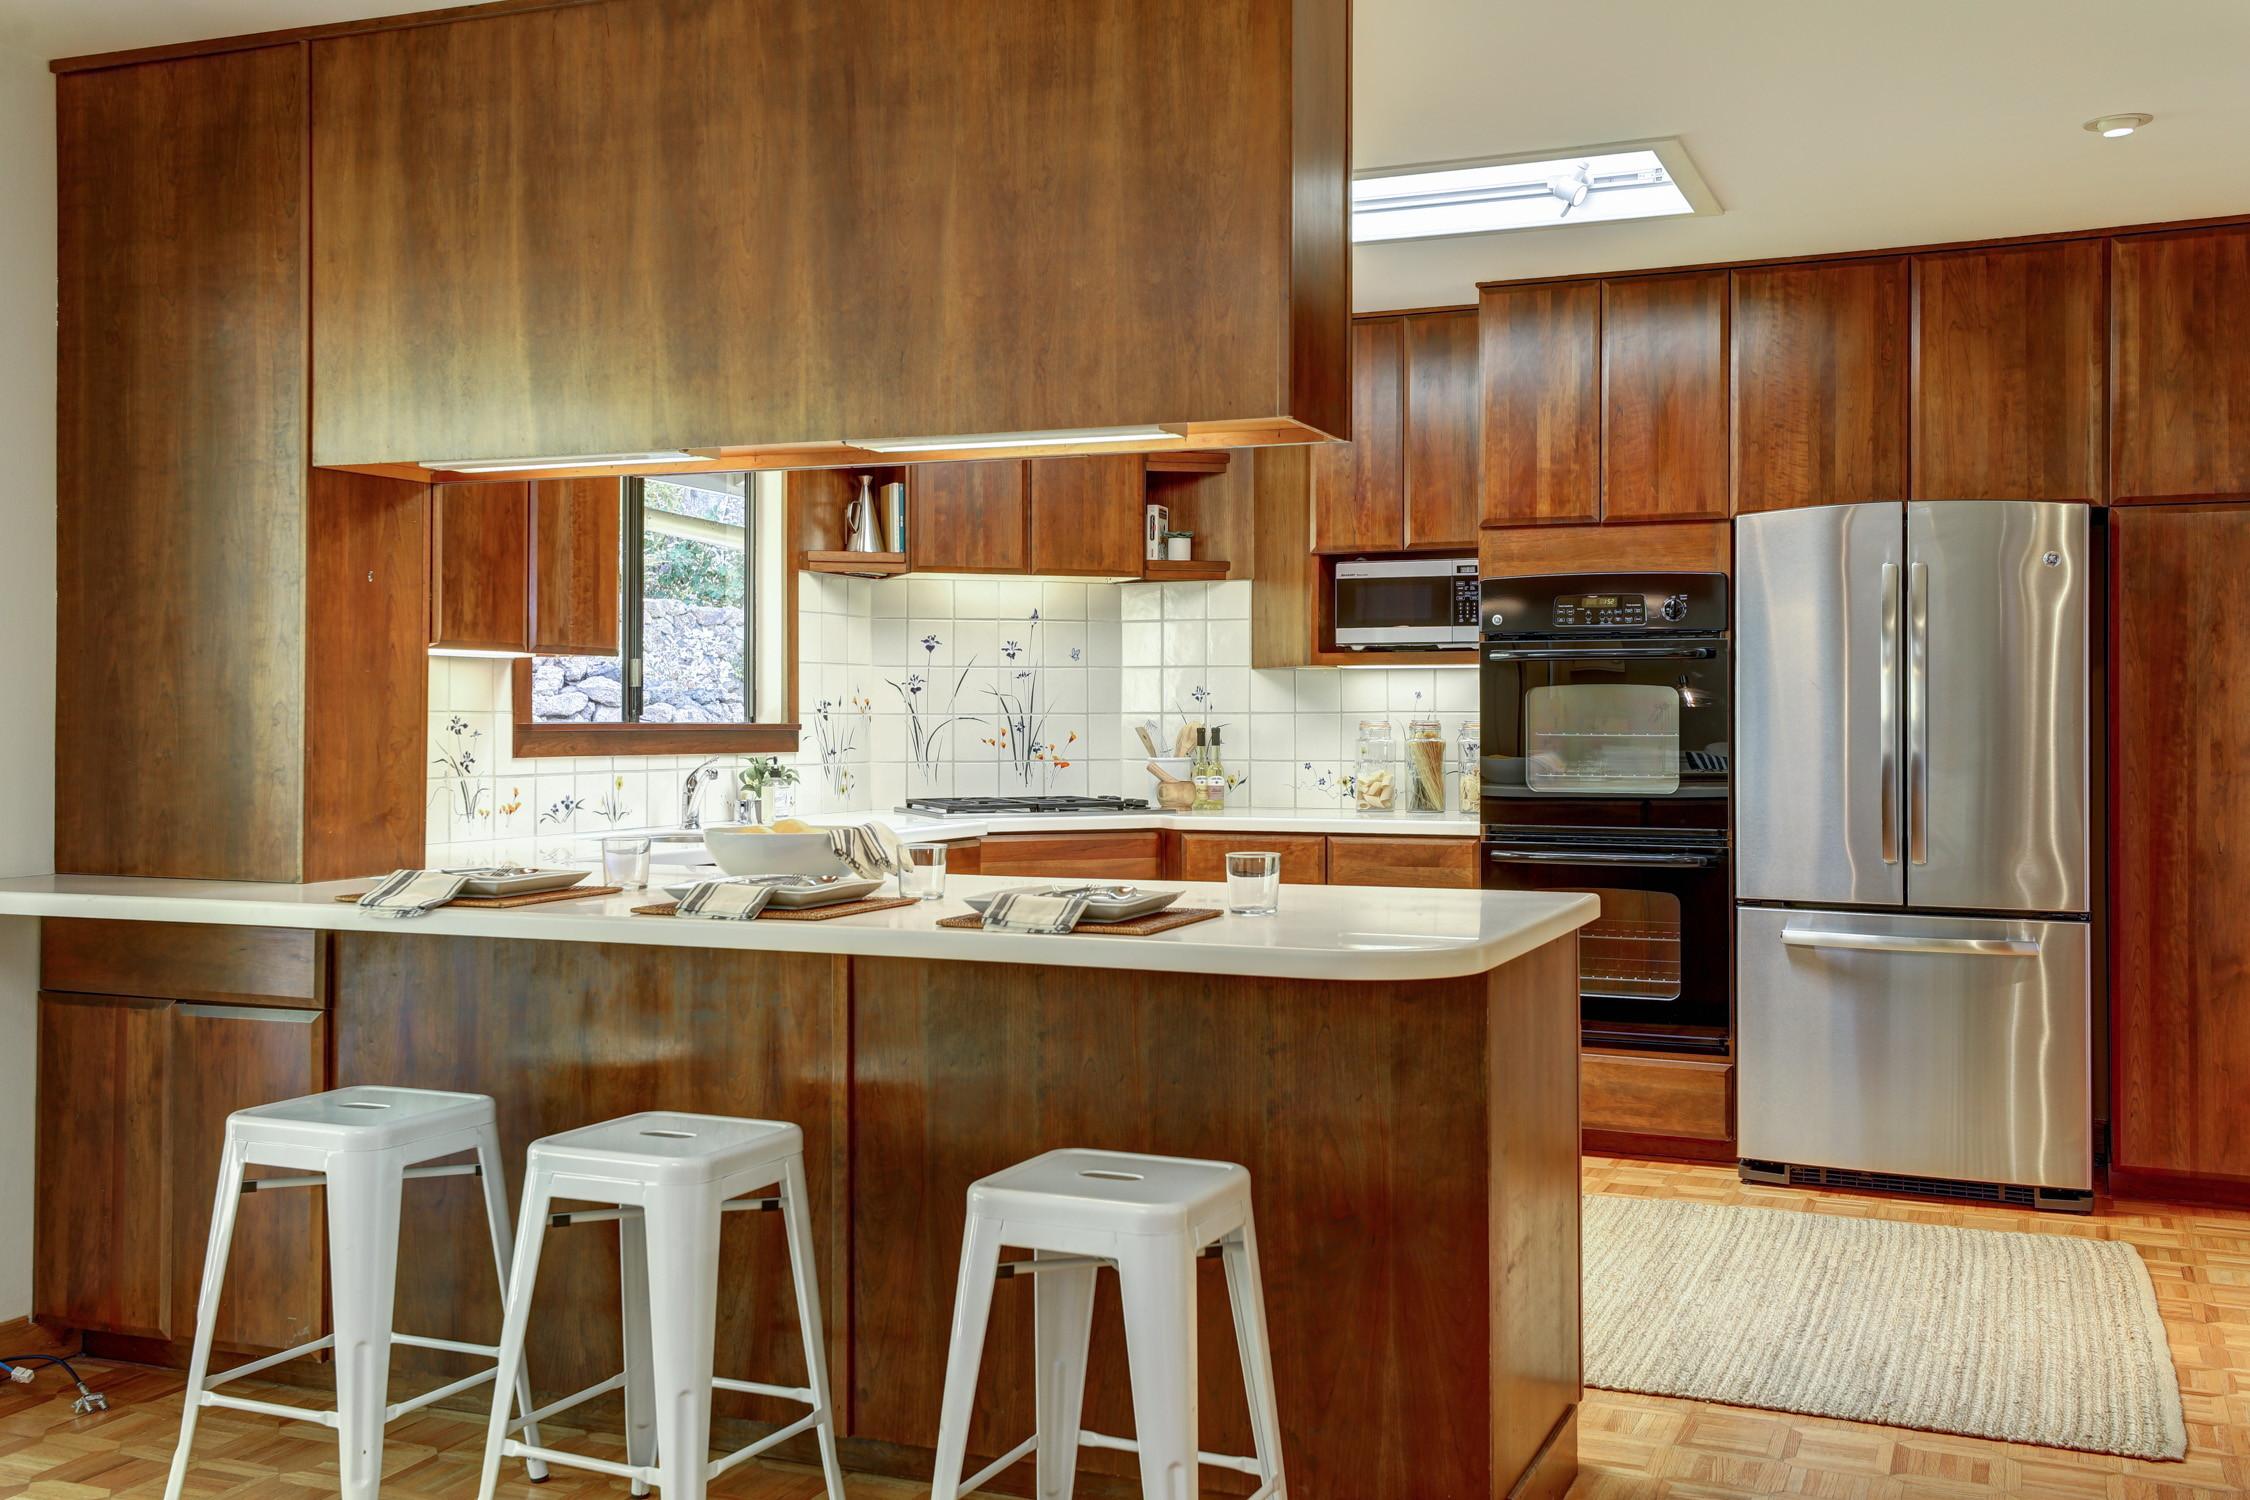 16Dorian 21 MLSSan Rafael Real Estate - Listed by Julia Fitzpatrick + Allie Fornesi Team Own Marin County .jpg